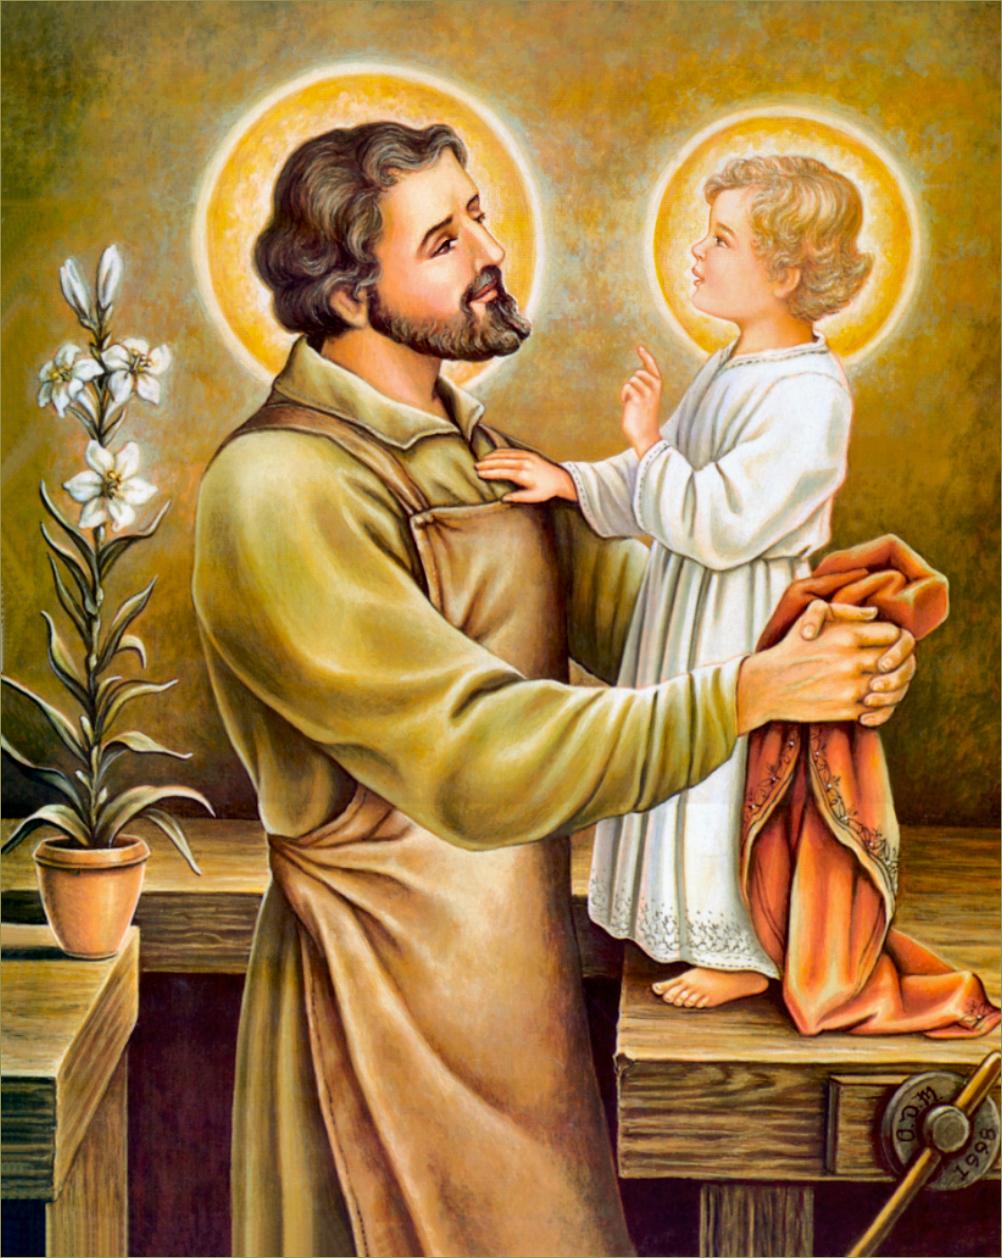 CATHOLIC TRADITION: ST. JOSEPH